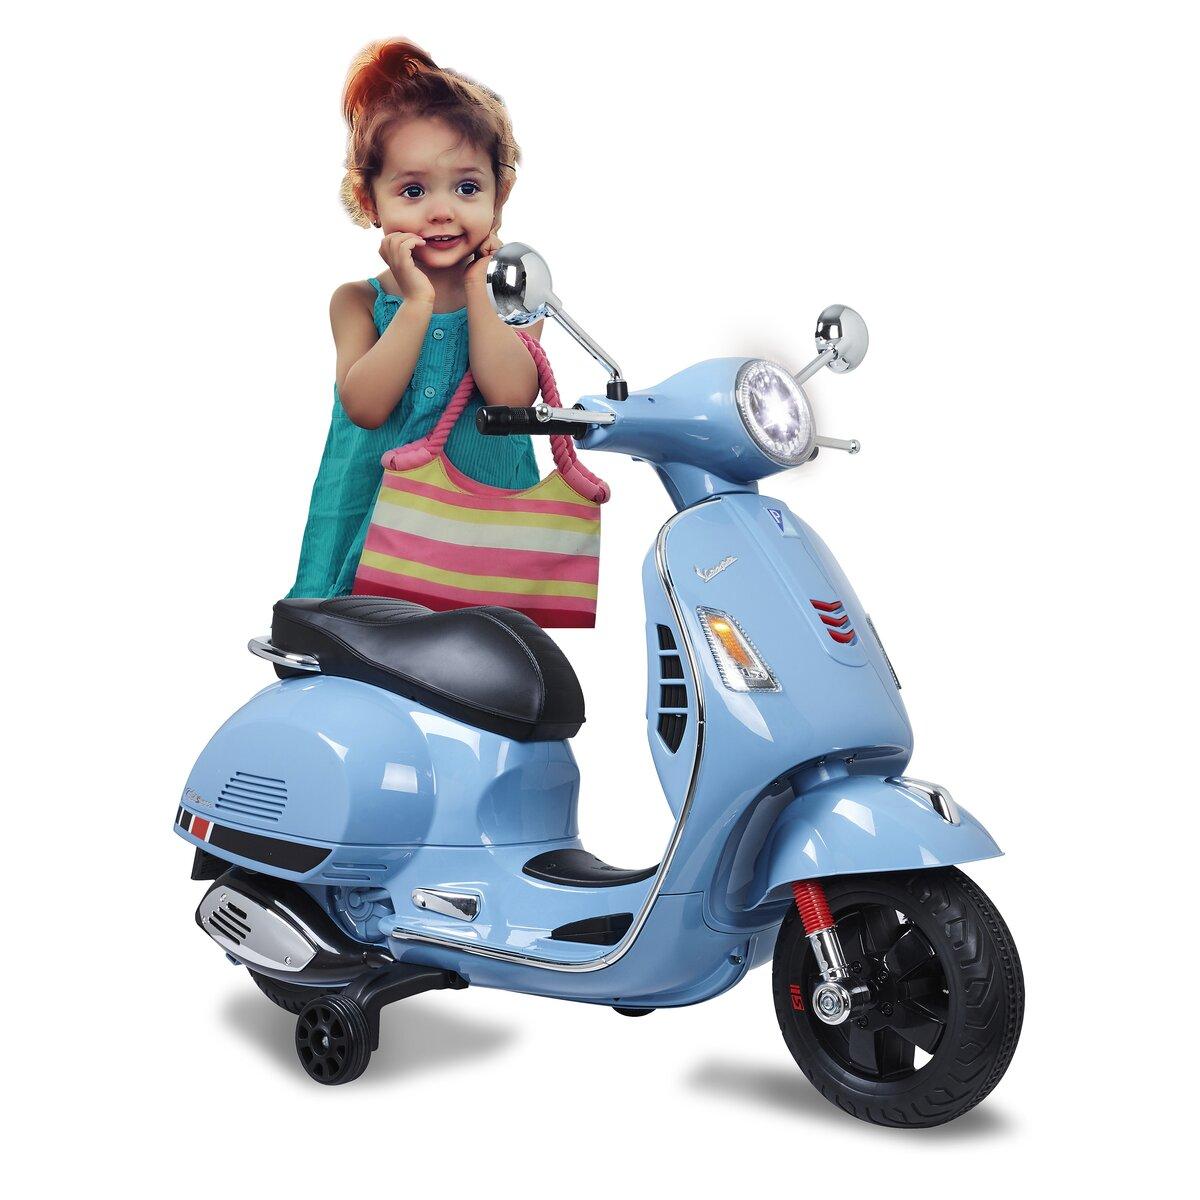 Jamara Ride-on Vespa modrá 12V 500 mA